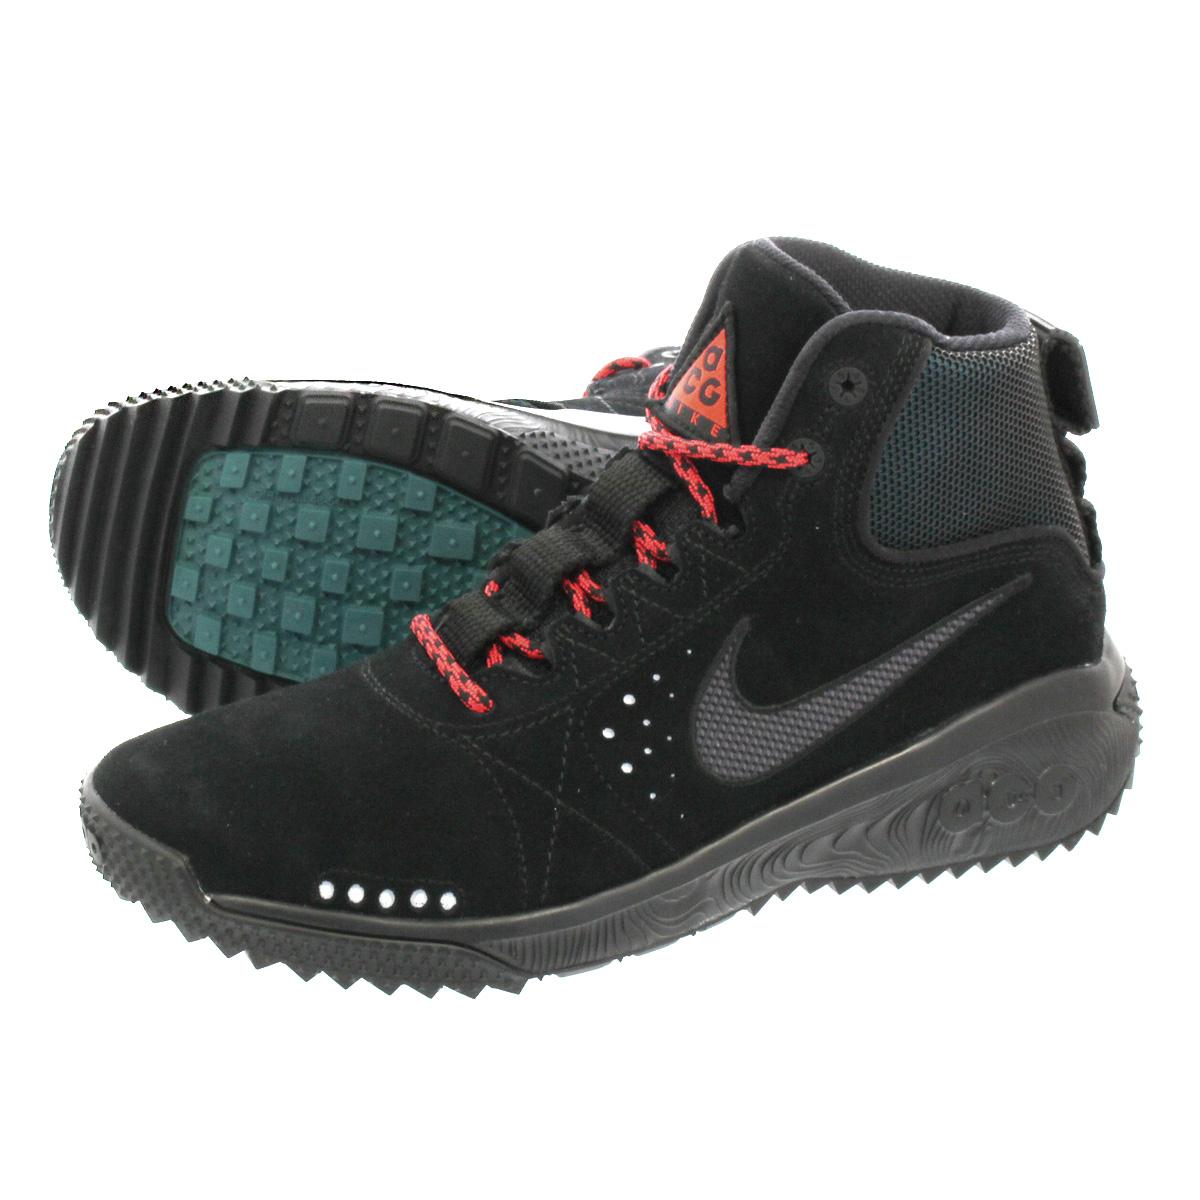 77bf0ca9e436 NIKE ACG ANGEL  S REST Nike ACG Angels rest BLACK OIL GREY THUNDER GREY GEODE  TEAL aq0917-001